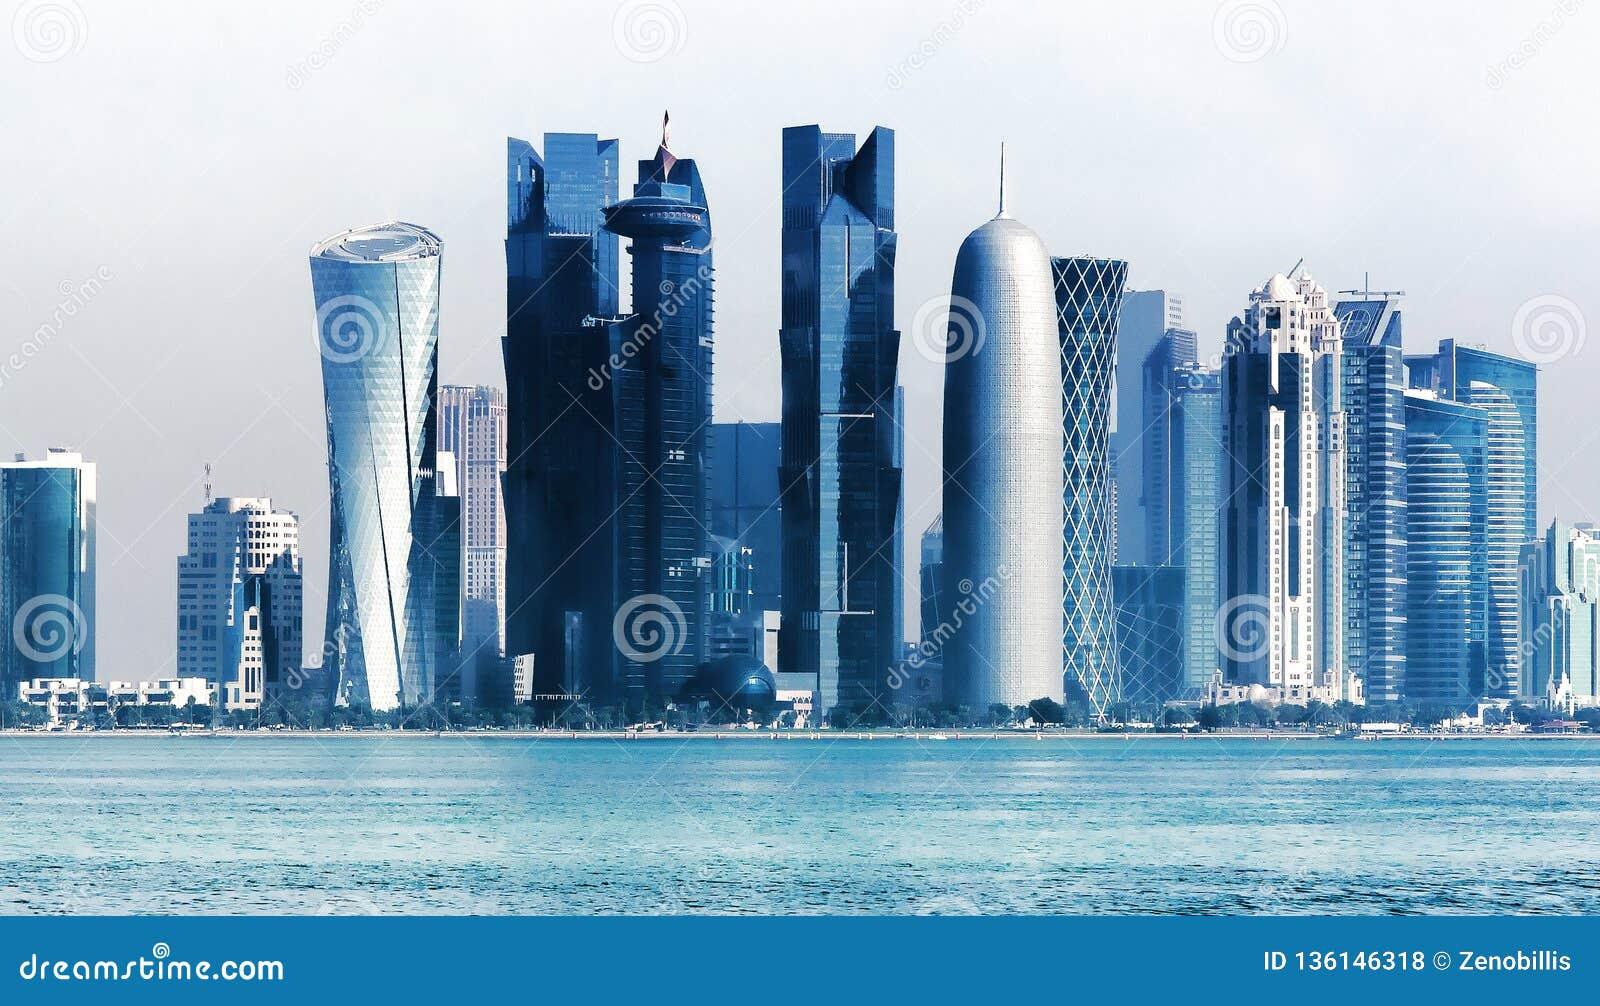 Skyline urbana futurista de Doha, Catar